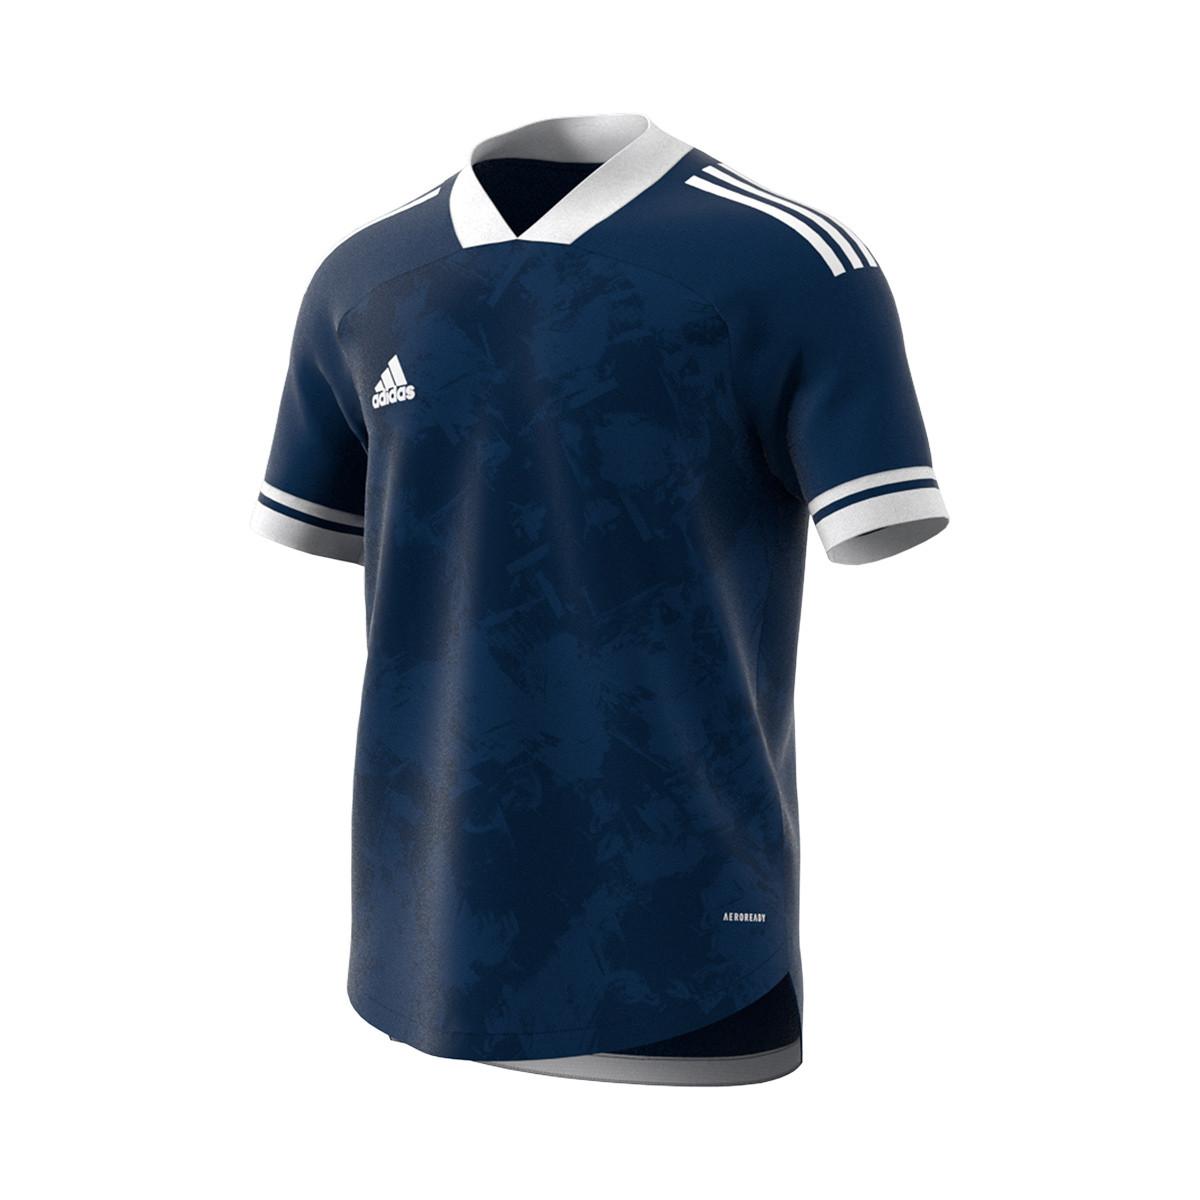 Jersey adidas Condivo 20 Team navy blue-White - Fútbol Emotion